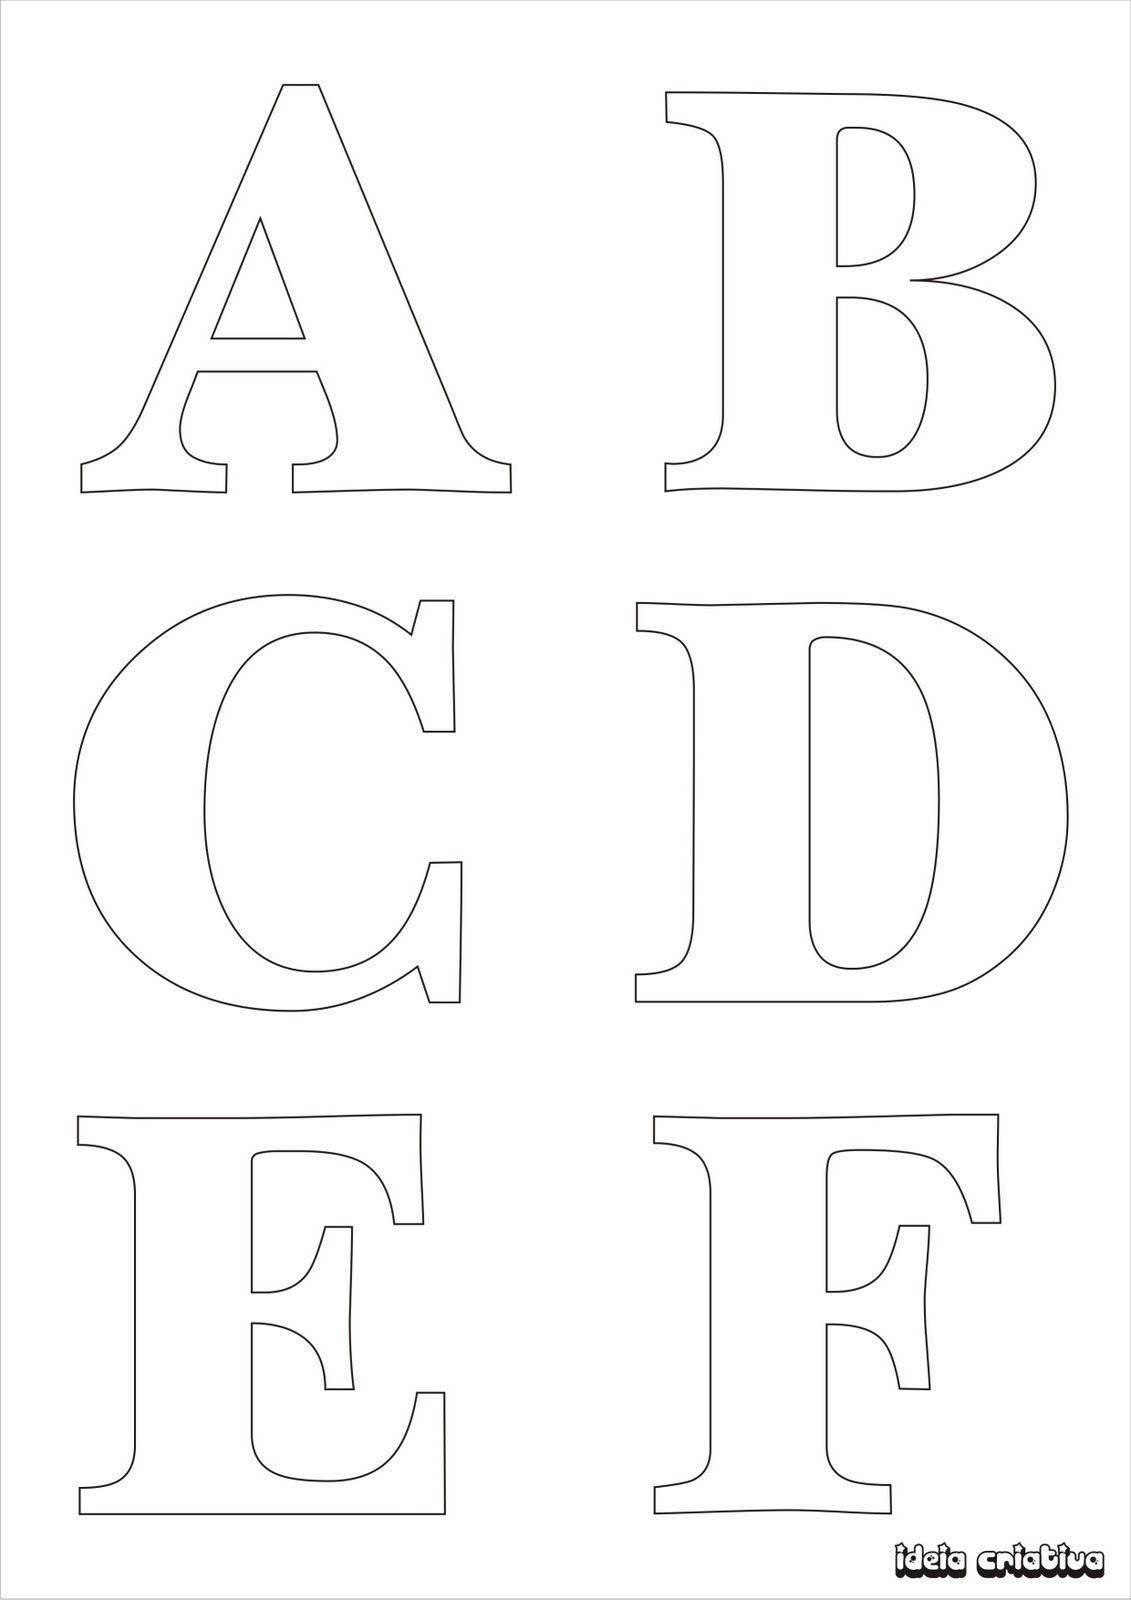 por gi barbosa marcadores alfabetos para imprimir moldes diversos ...